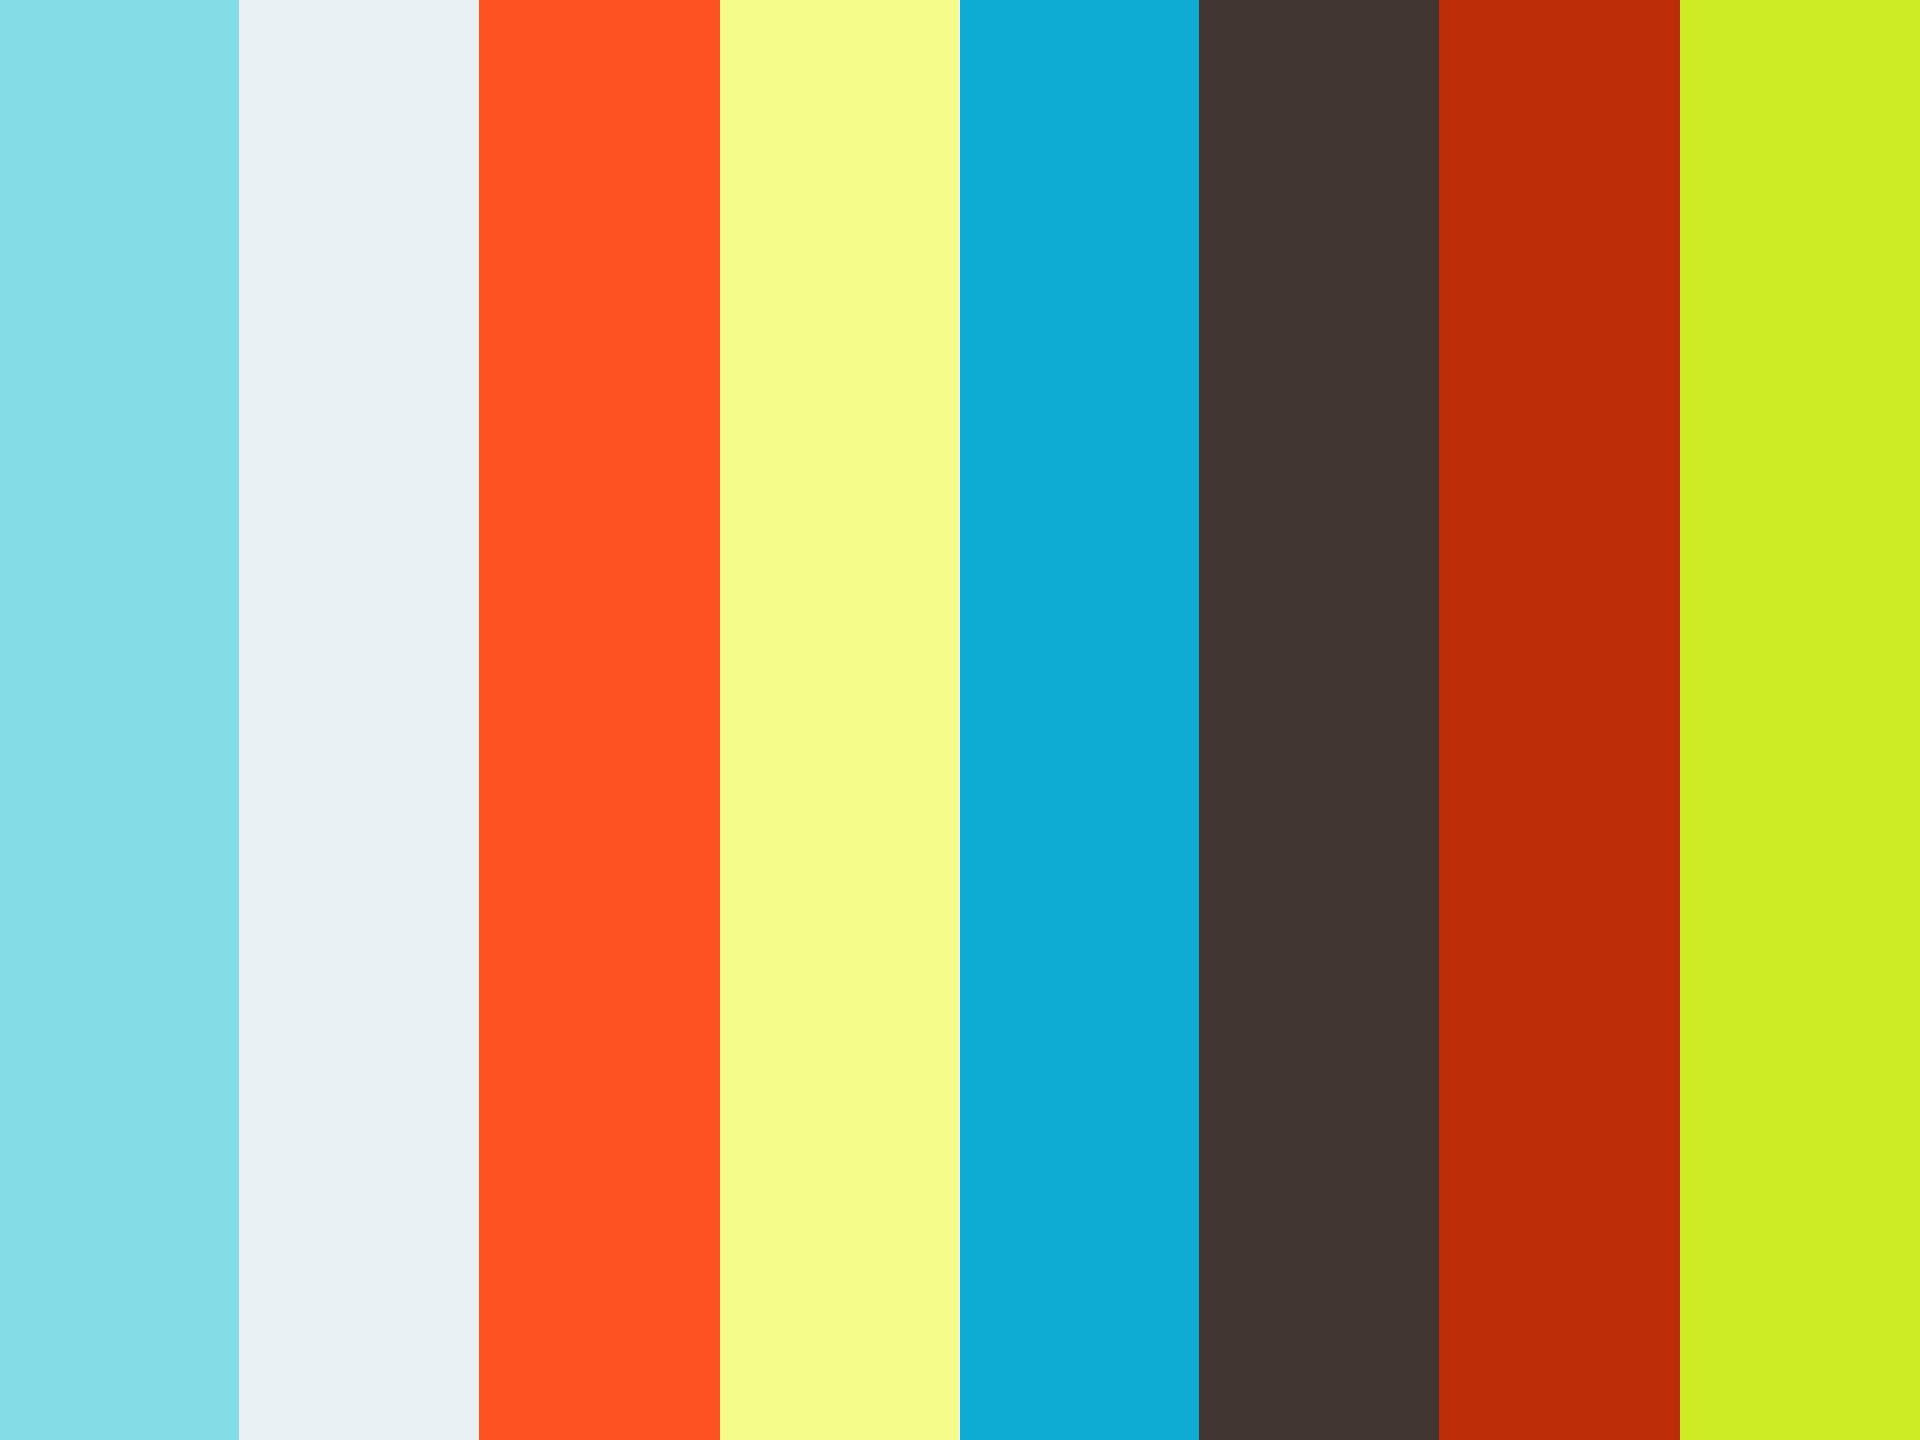 IPS e.max ジルキャド MT マルチ チェアサイドブロック草間幸夫先生によるビデオセミナー 【全10動画】